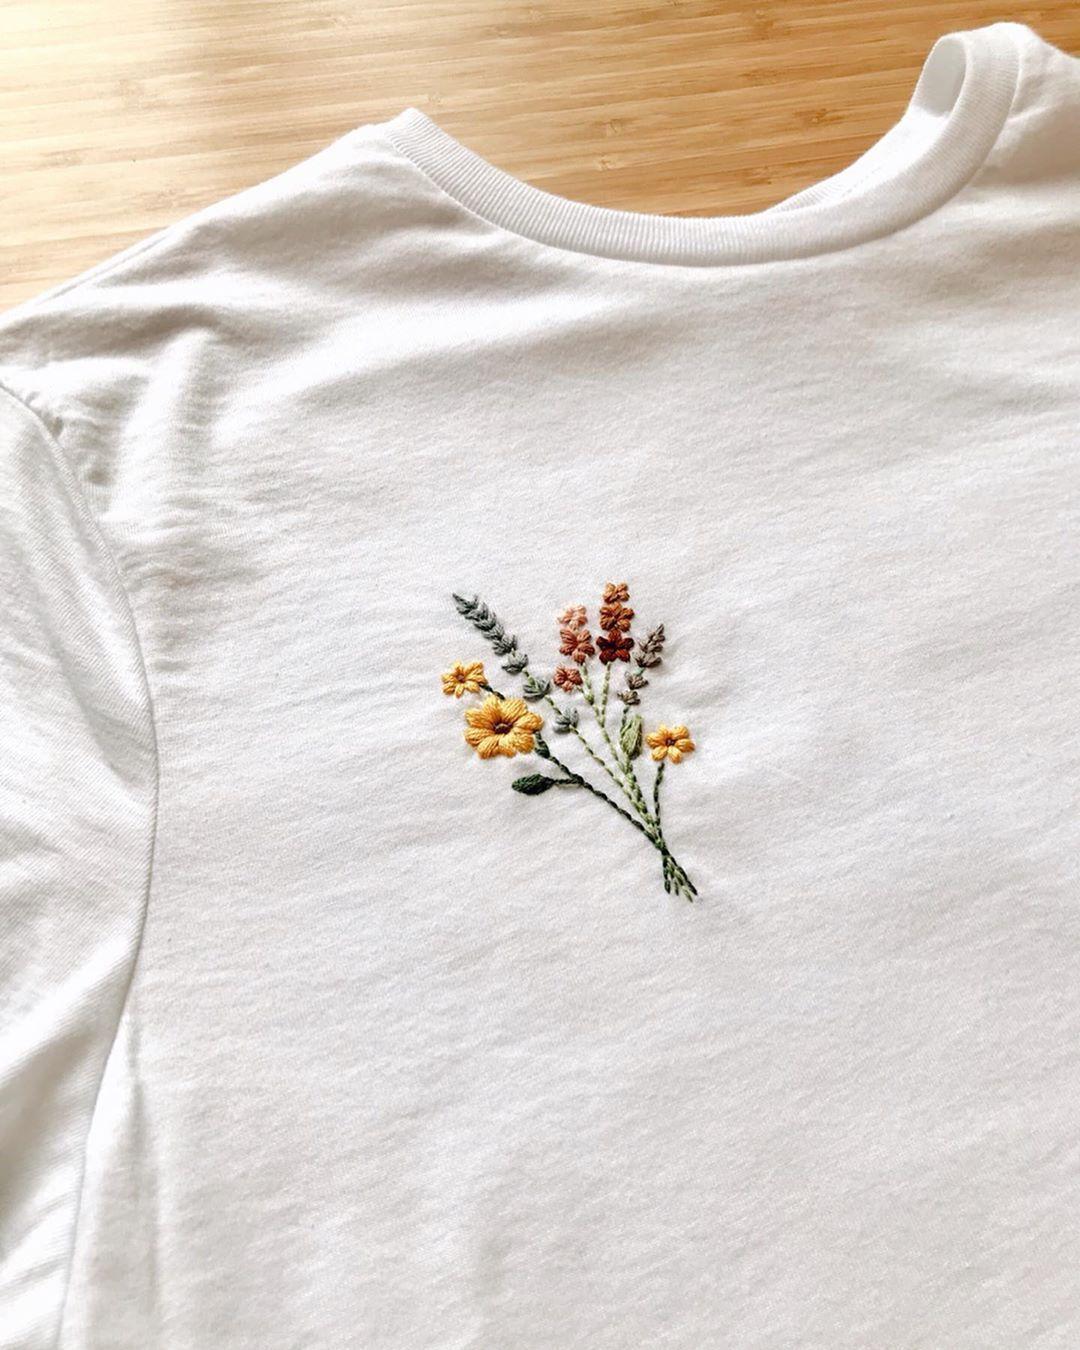 Shirt Design Inspiration Creative ; Shirt Design Inspiration